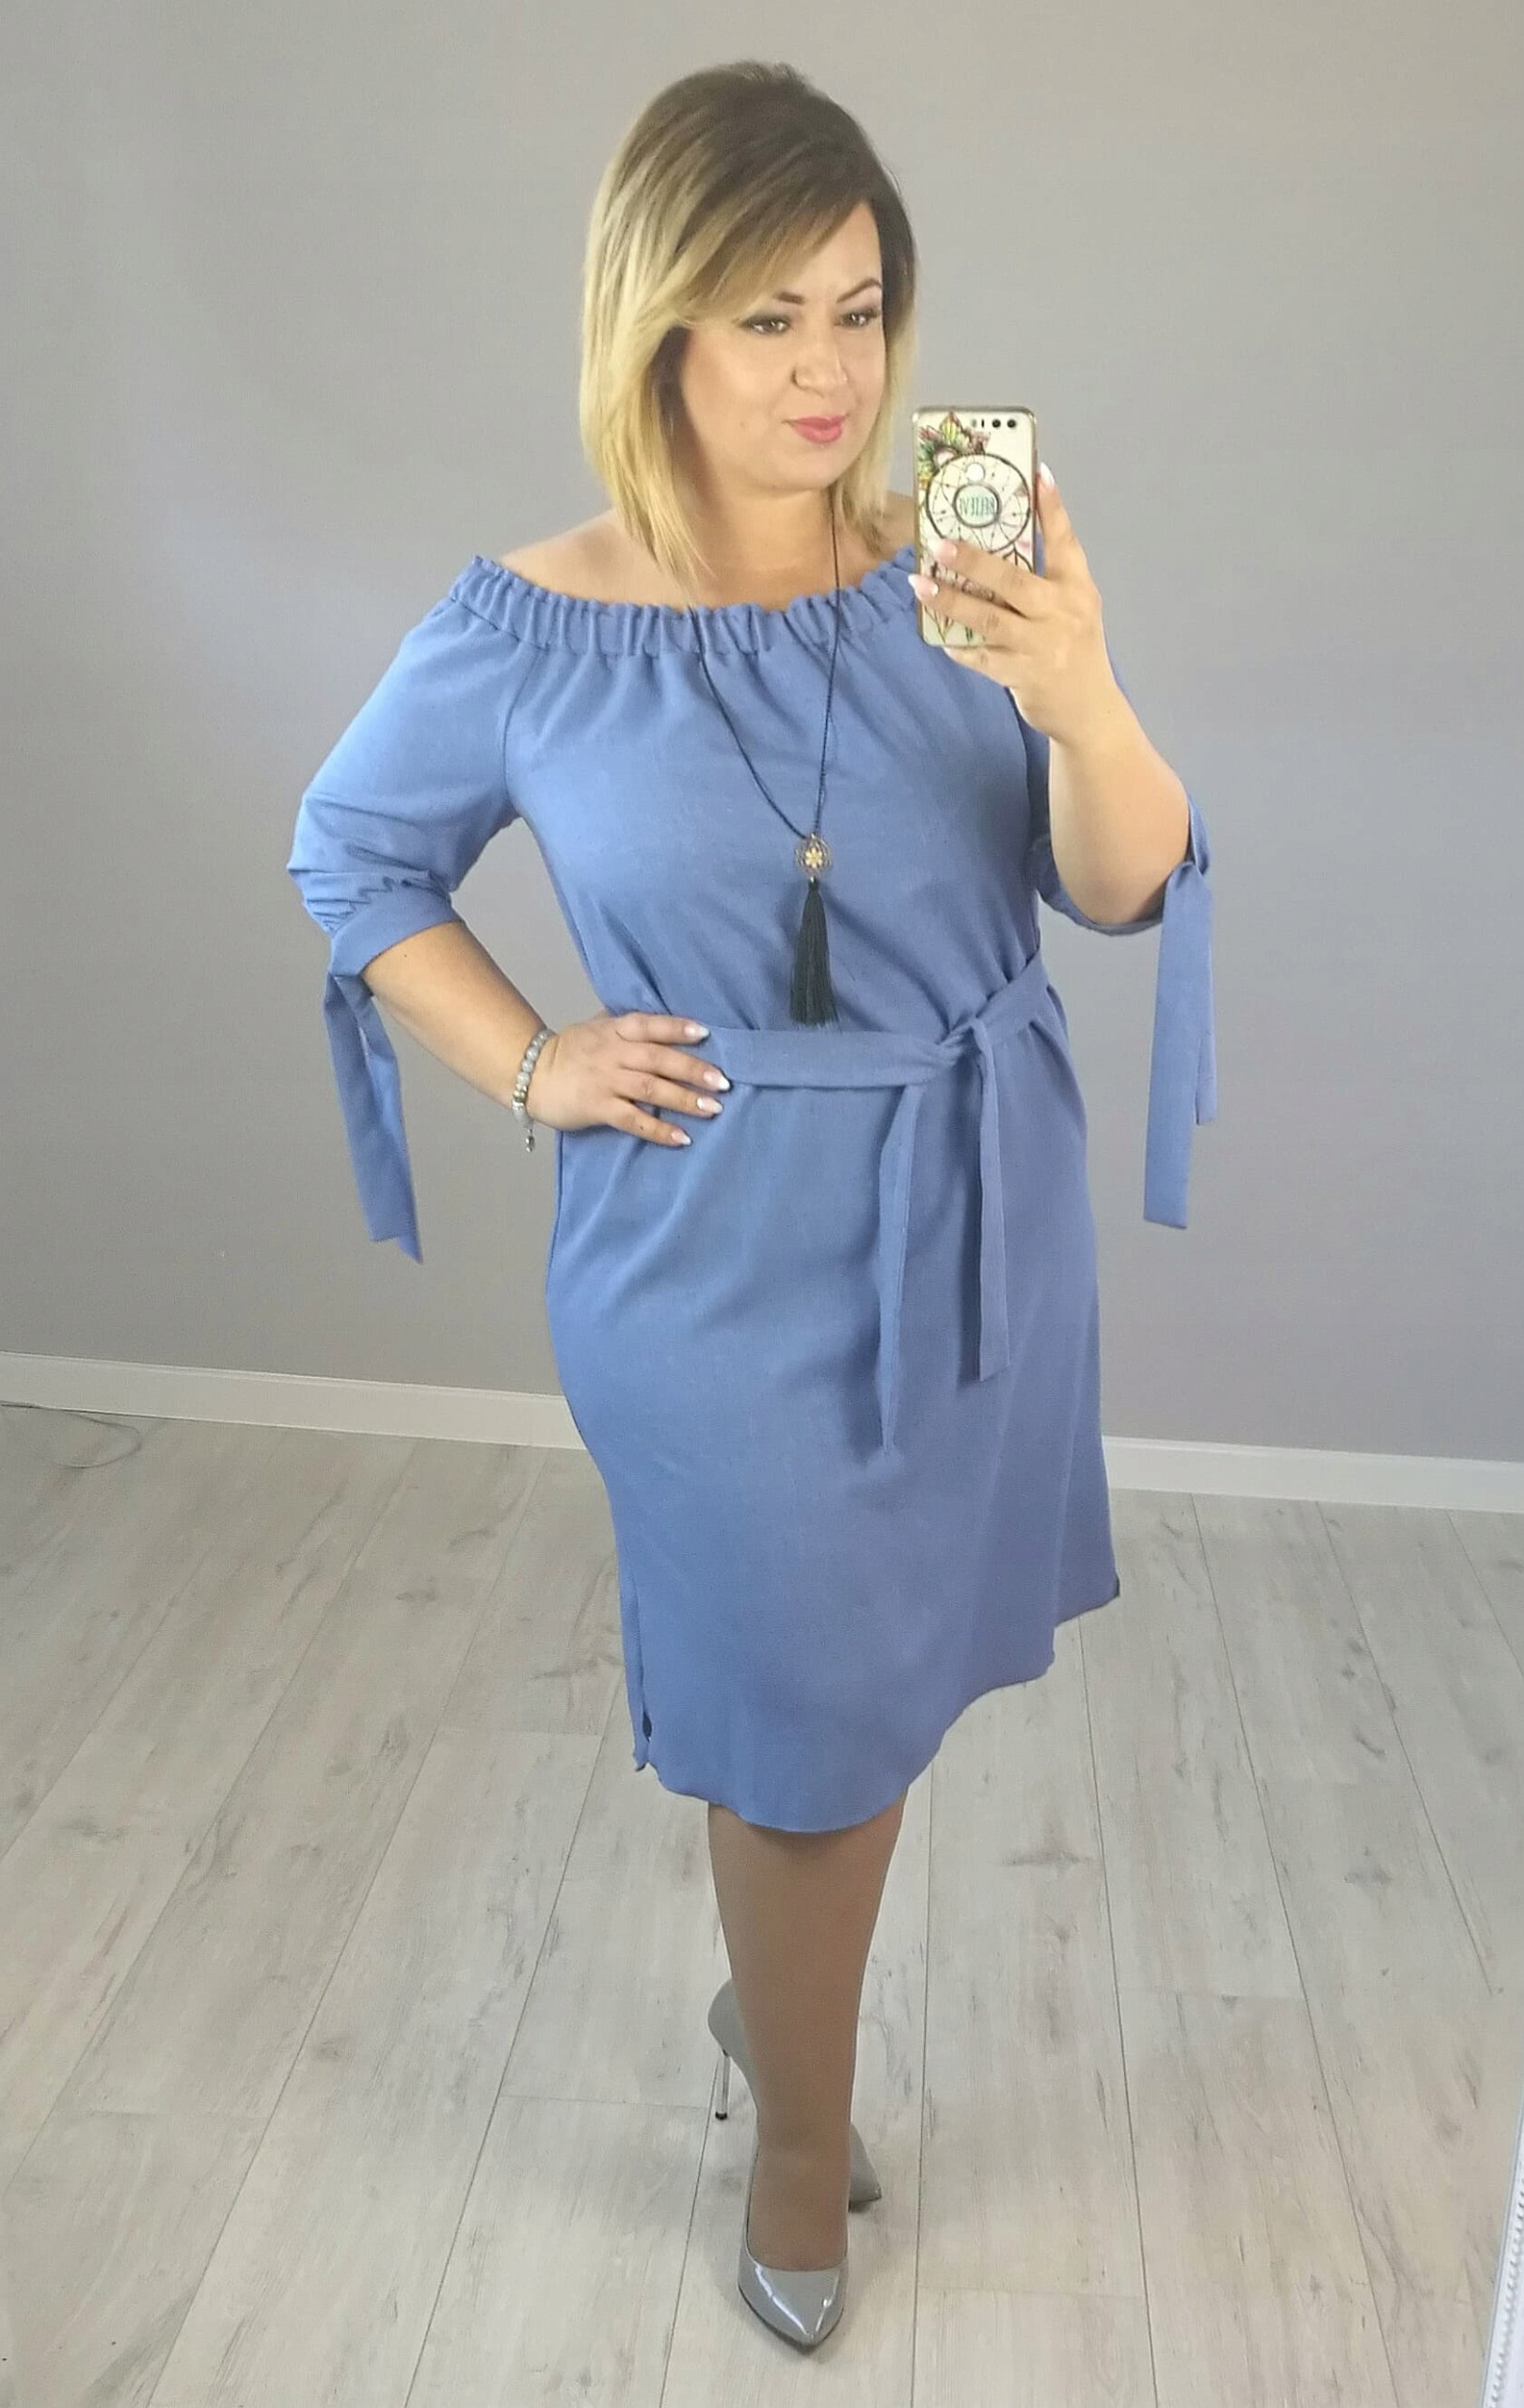 50de3c700c Sukienka Hiszpanka blue jeans 48 50 - 7385745027 - oficjalne ...